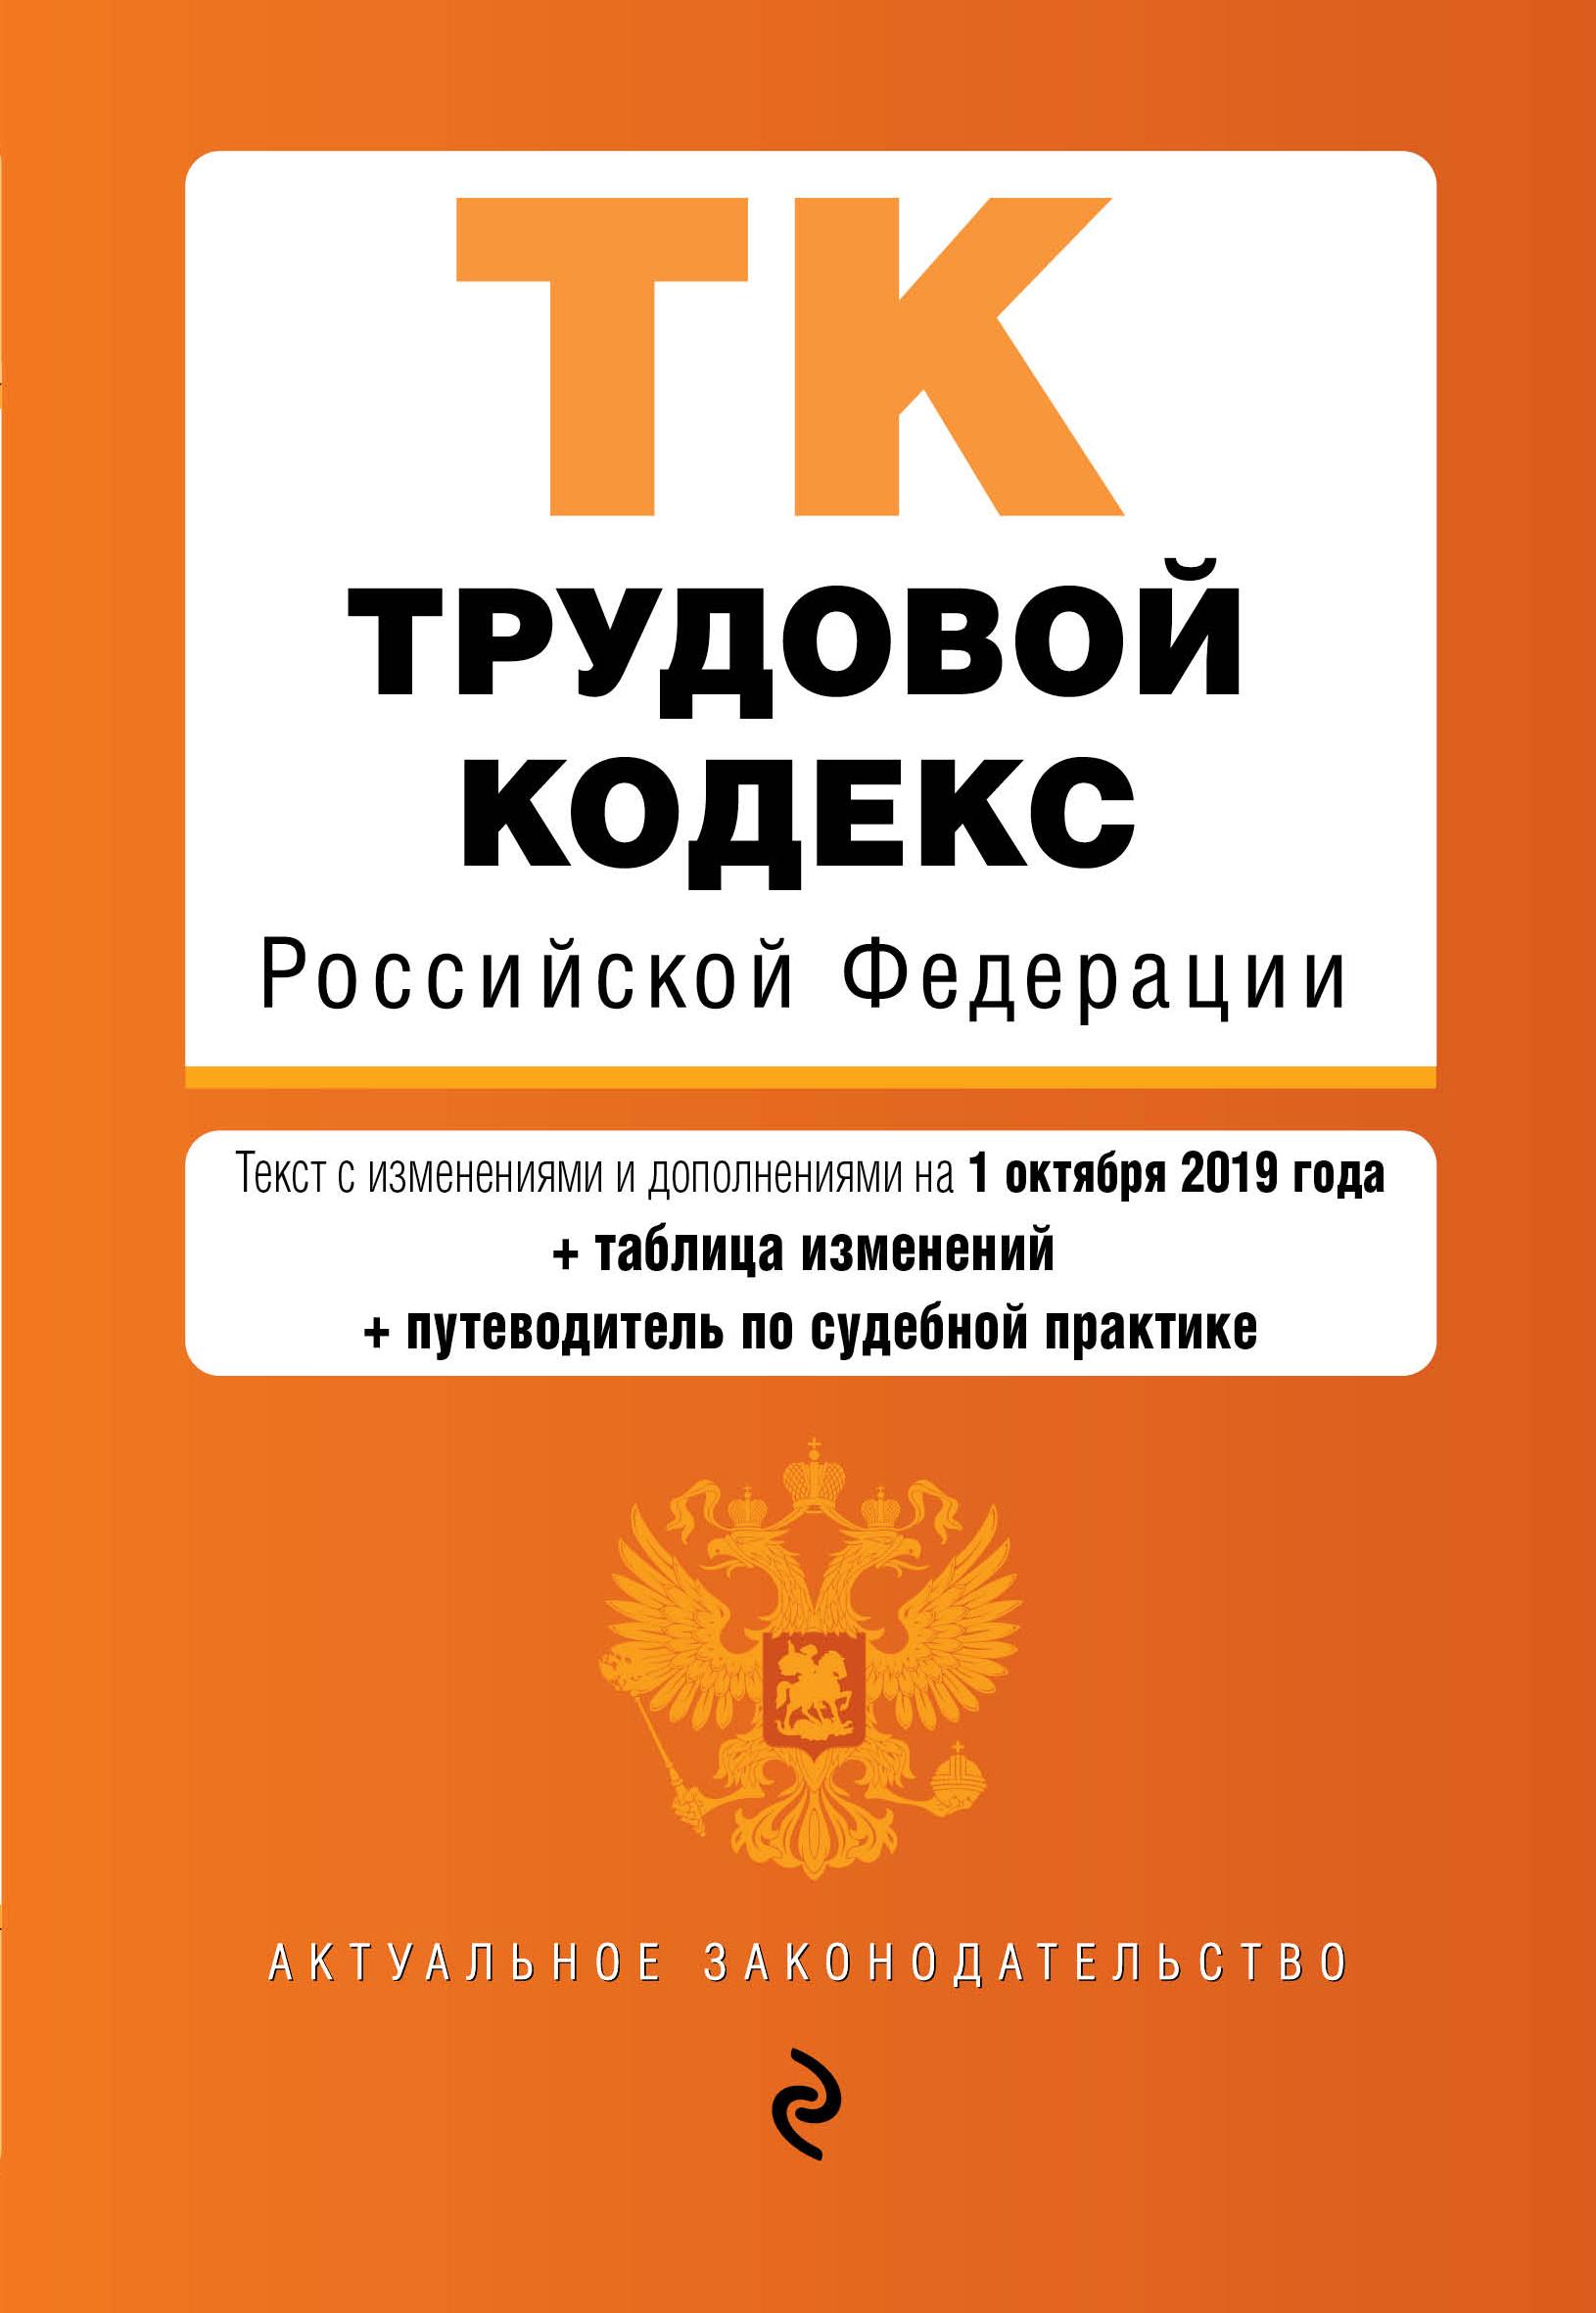 Trudovoj kodeks Rossijskoj Federatsii. Tekst s izm. i dop. na 1 oktjabrja 2019 goda (+ tablitsa izmenenij) (+ putevoditel po sudebnoj praktike)